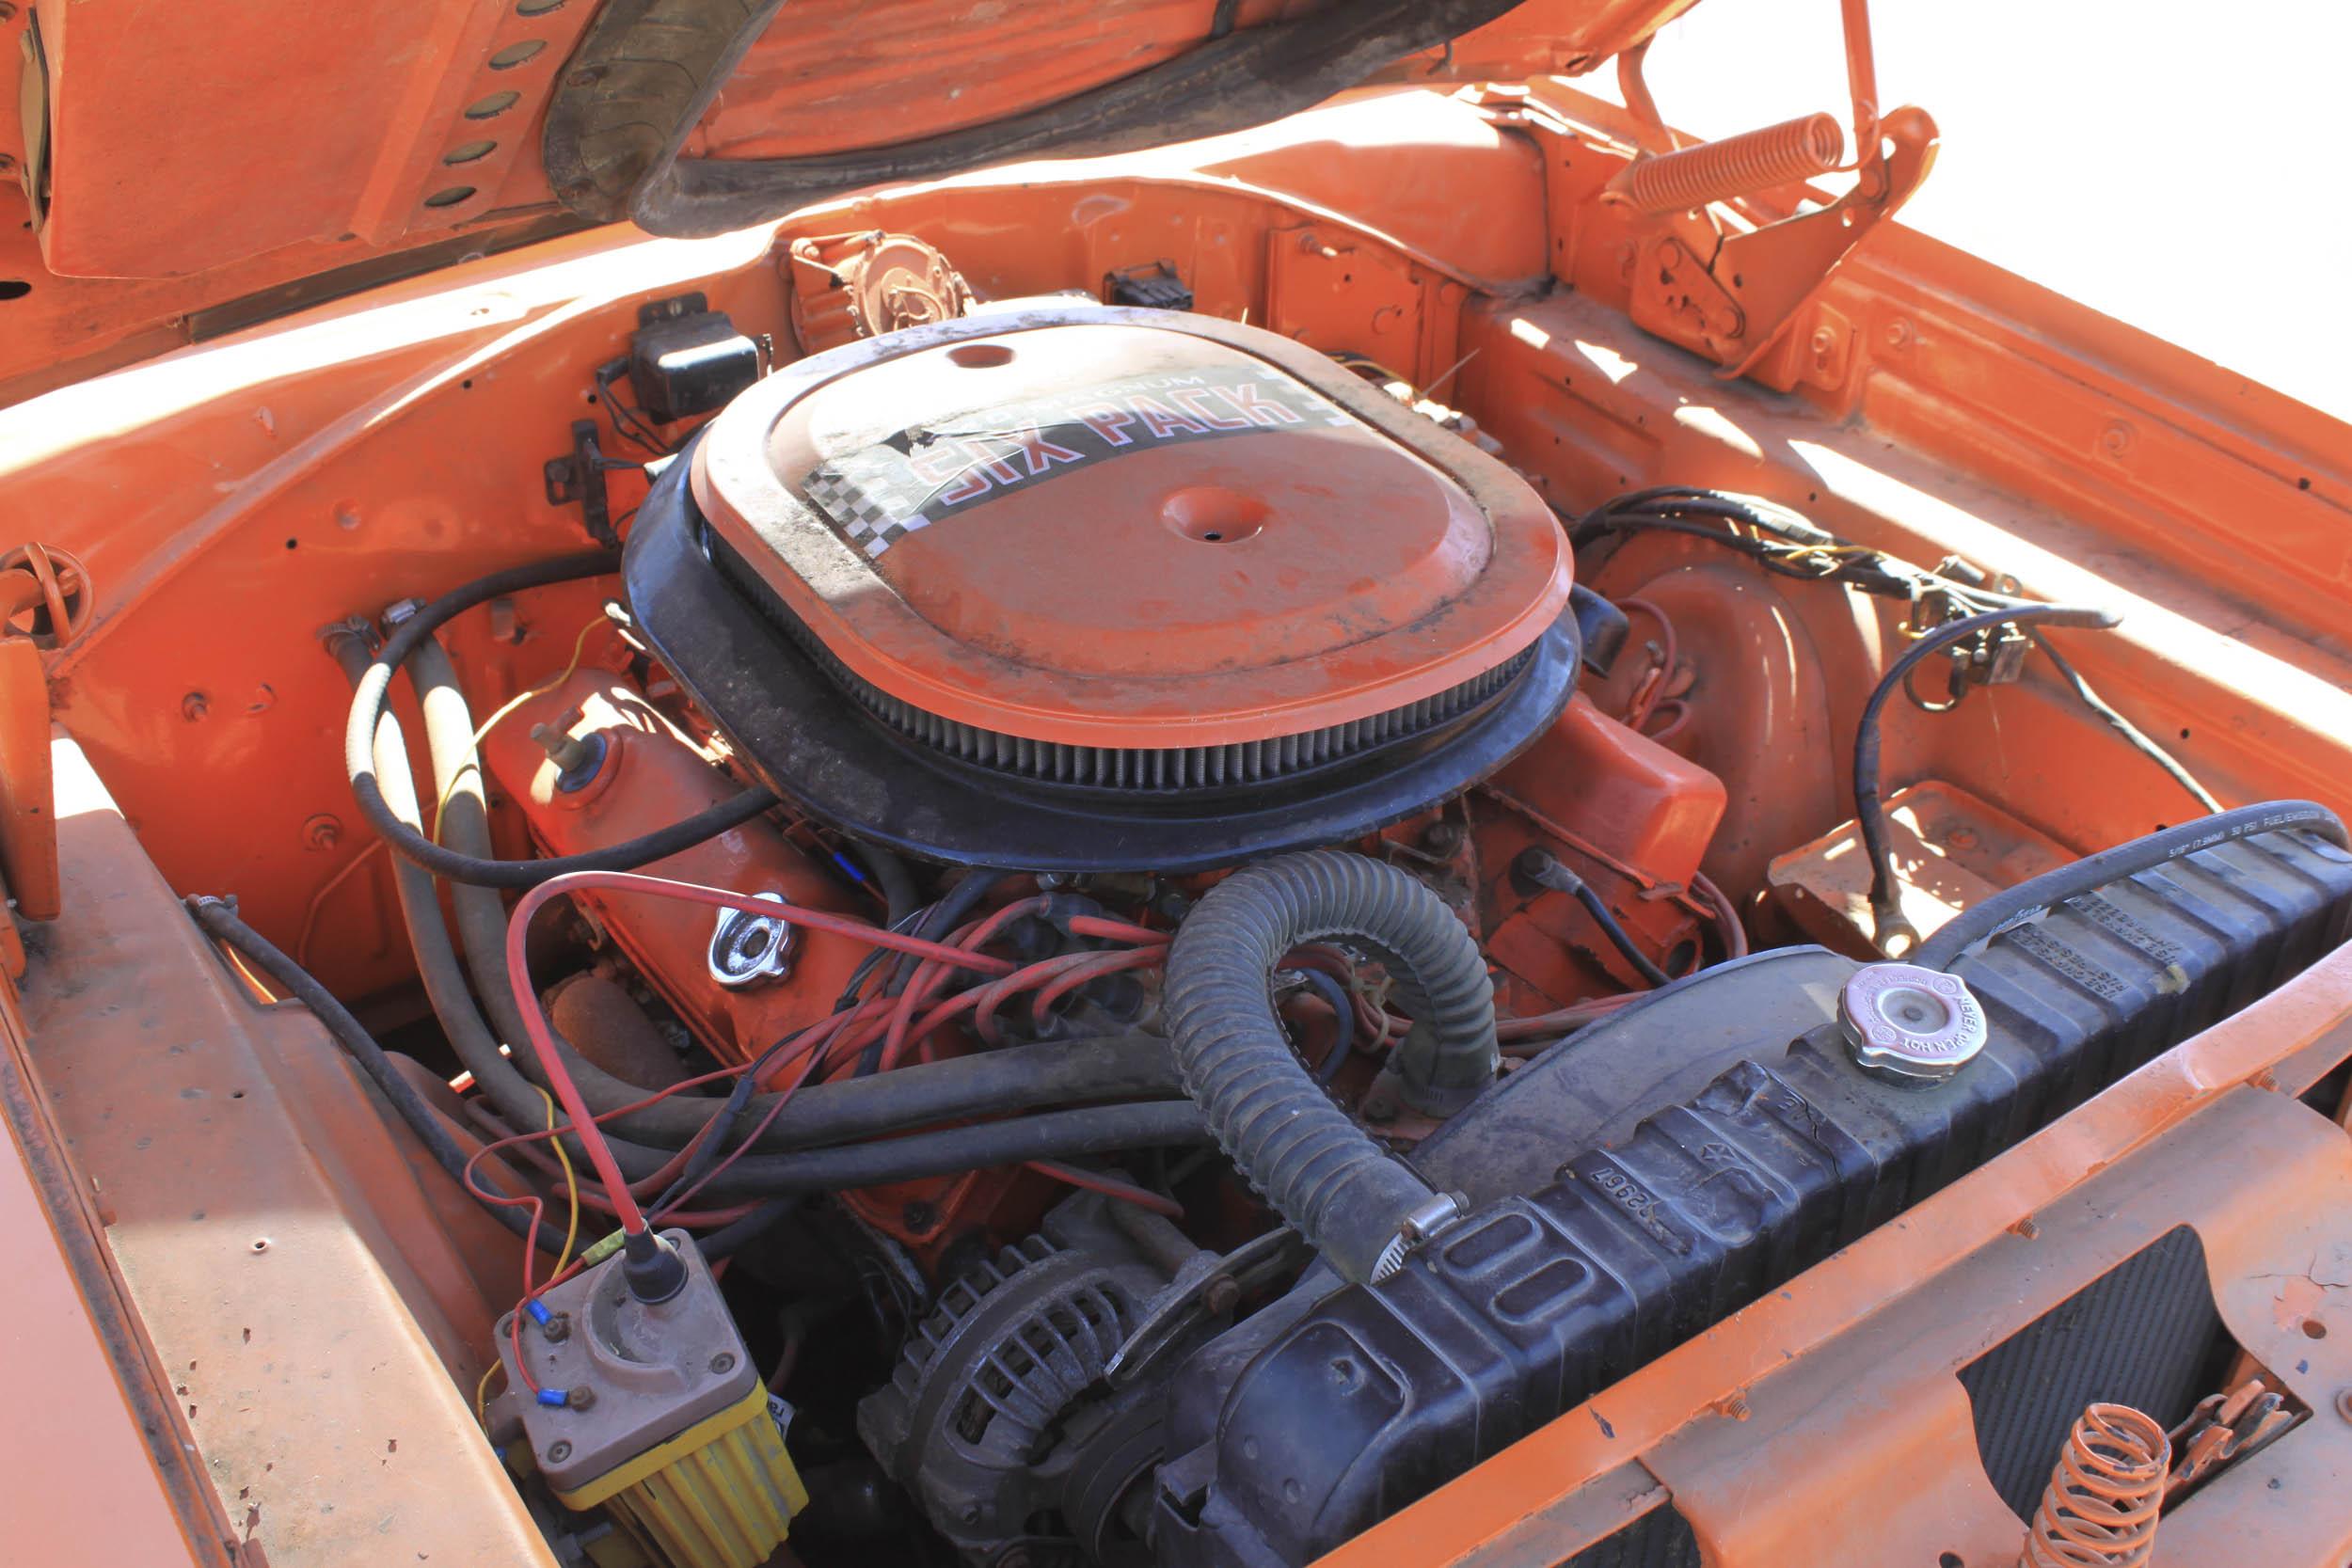 1970 Dodge Super Bee 440 6 pack engine